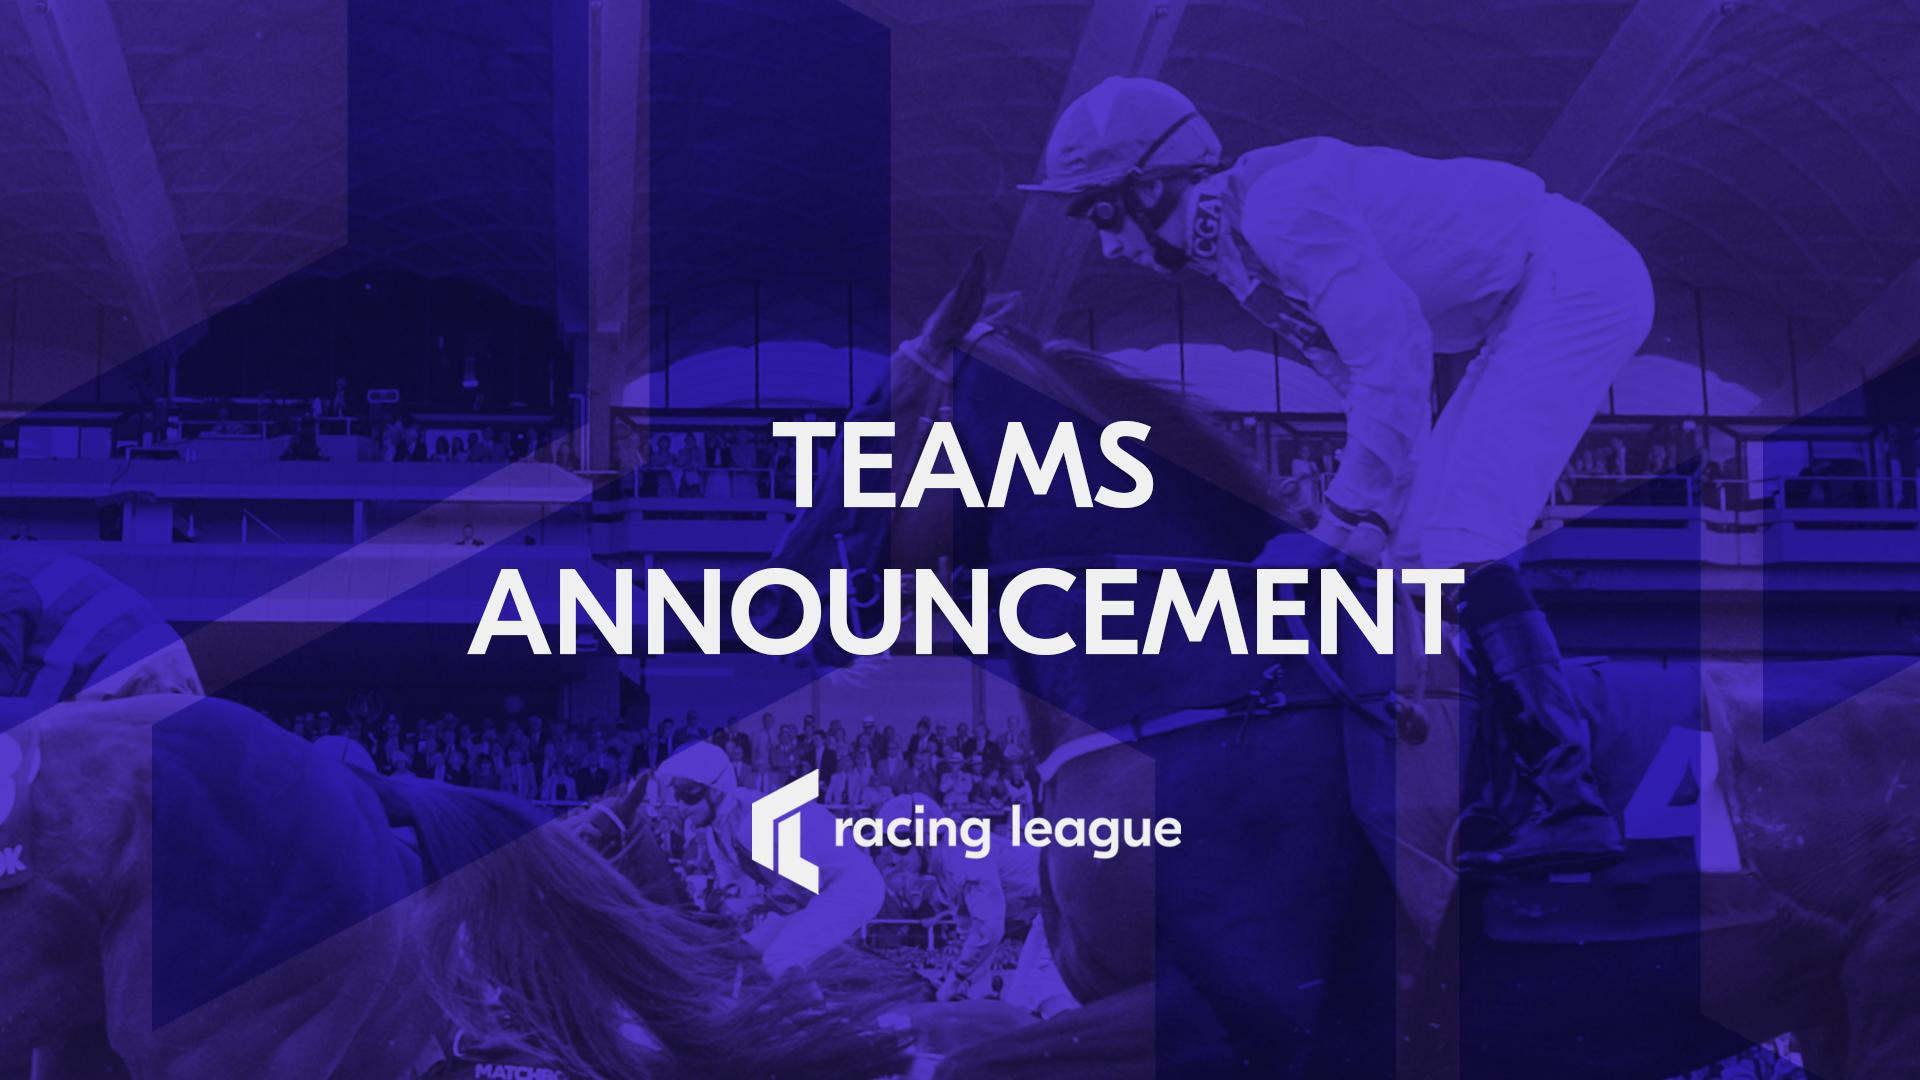 Racing League's First 6 Teams Announced